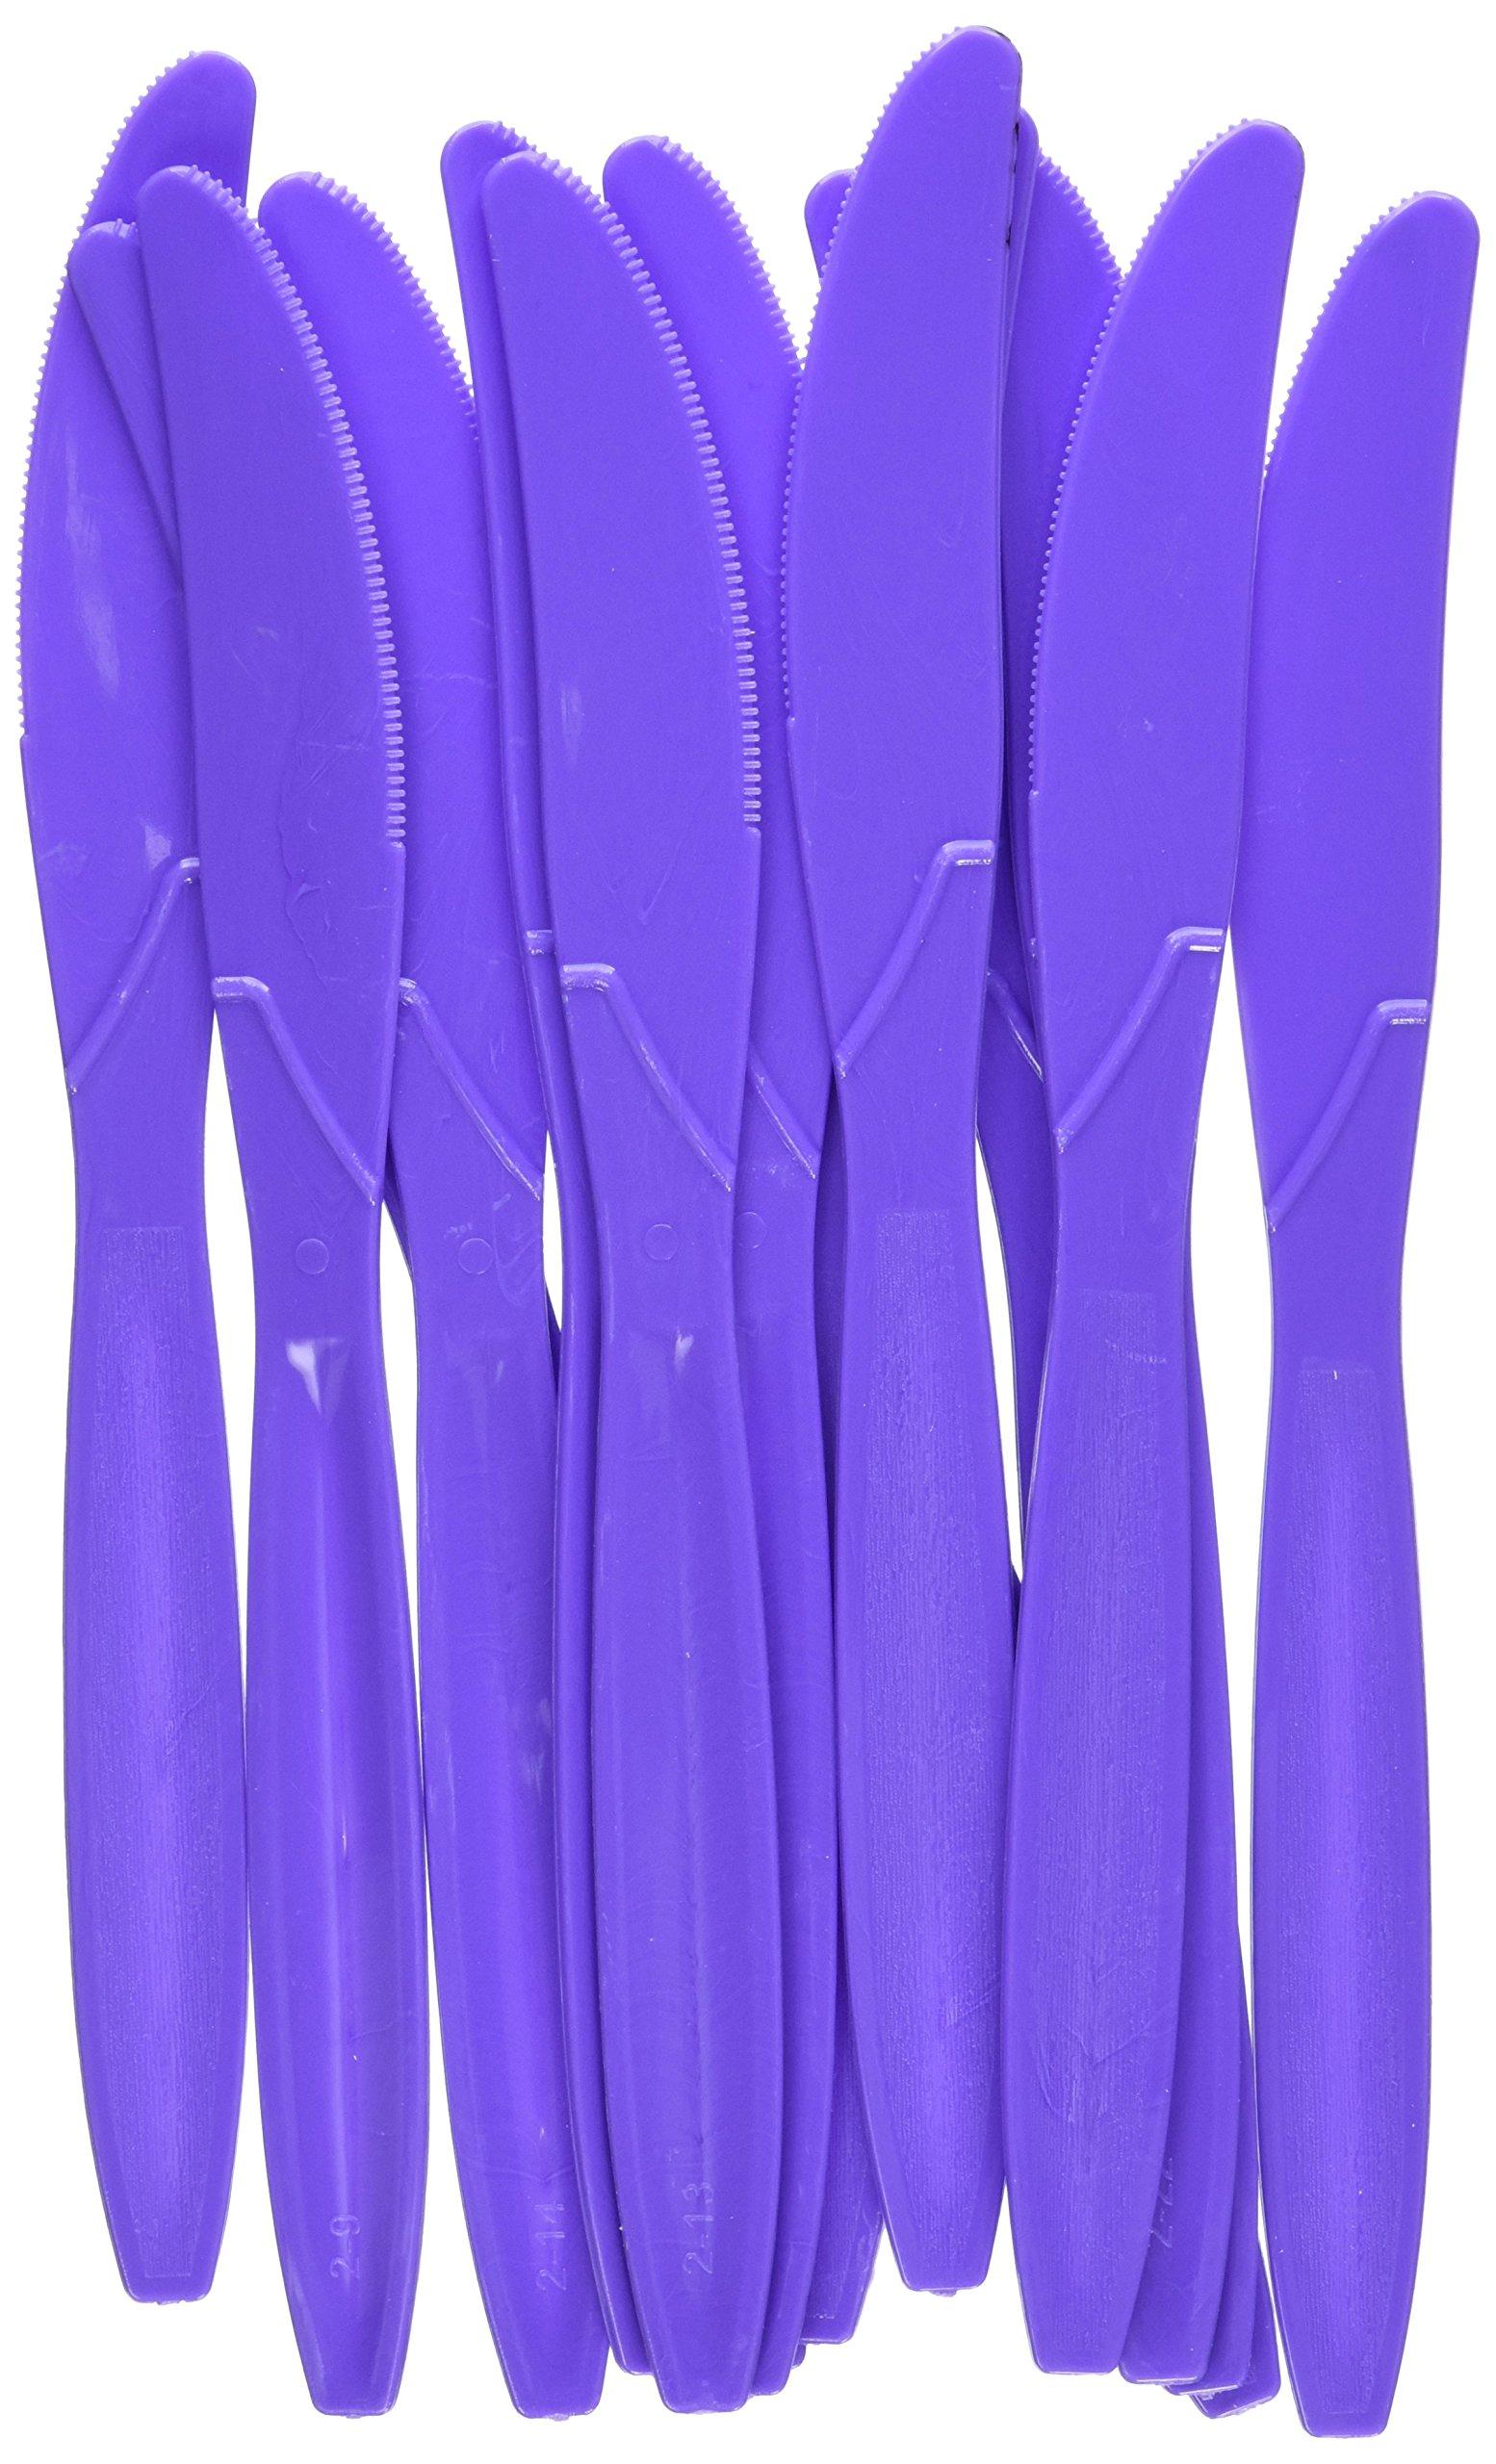 Amscan 43603.106 Big Party Pack Festive Plastic Knives, 8'' x 3.2'', Purple